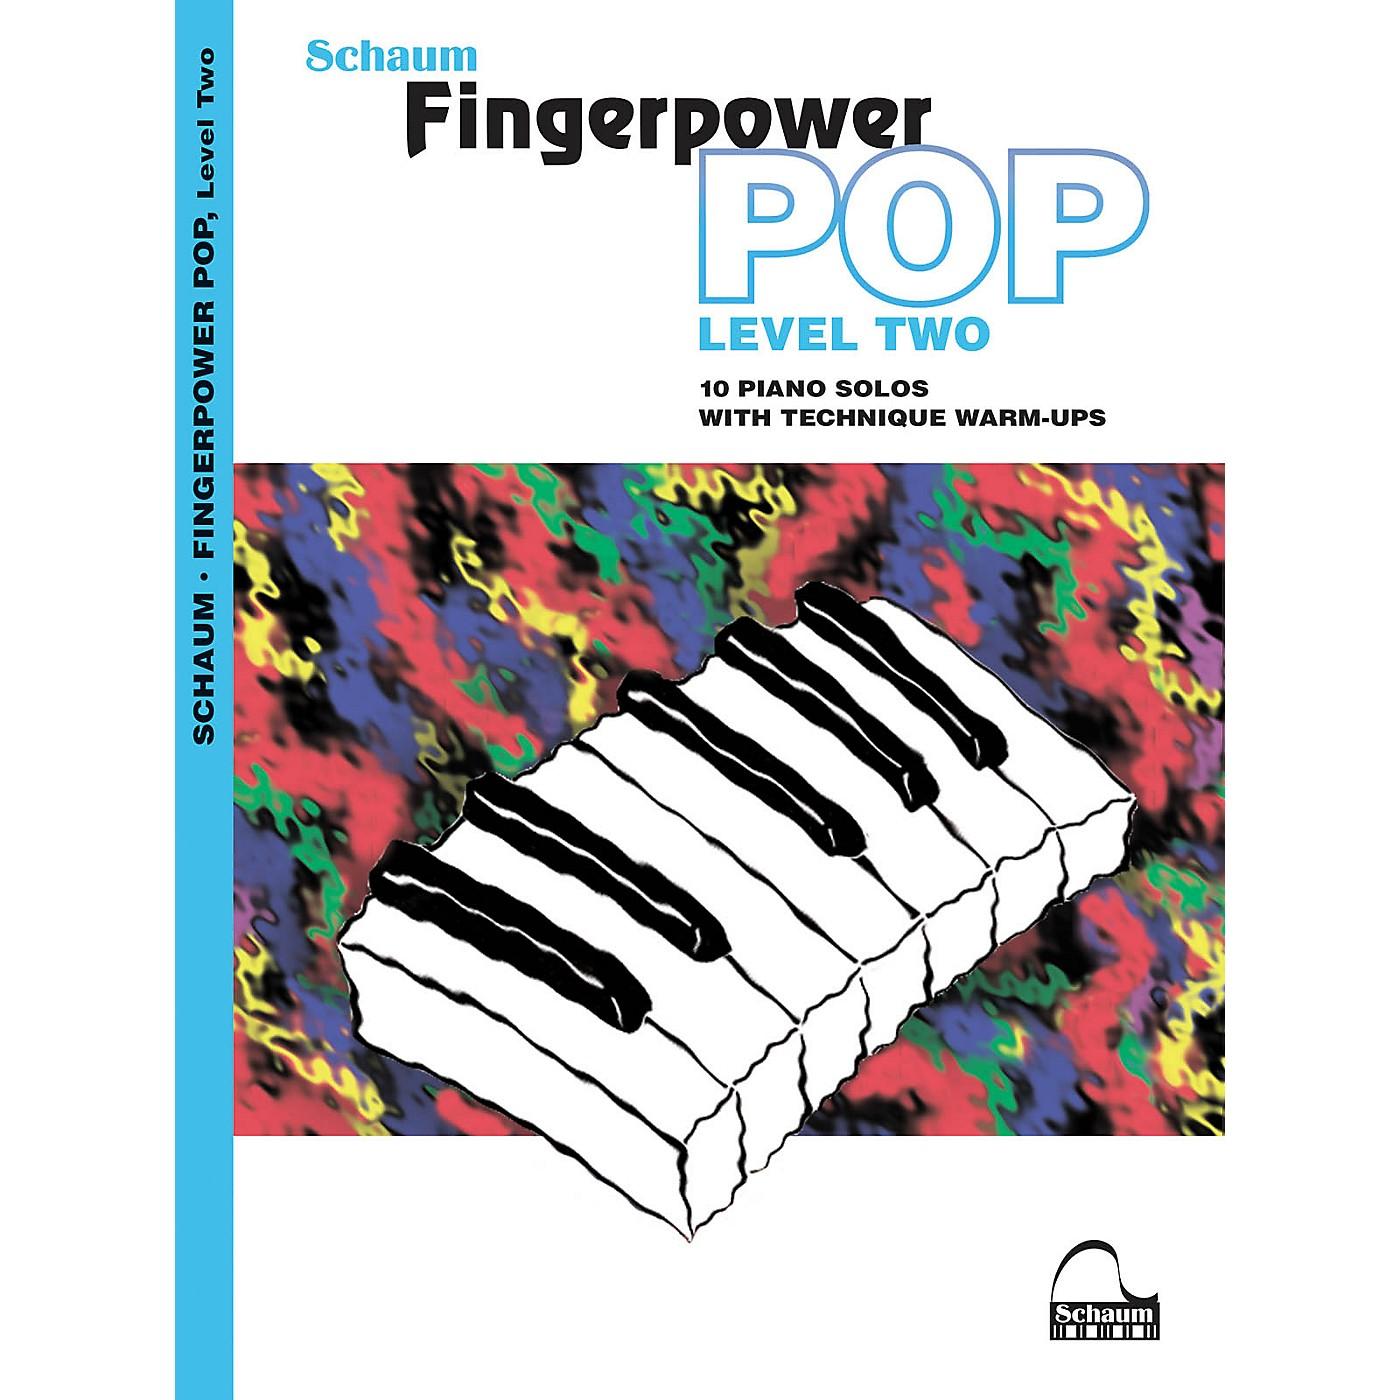 SCHAUM Fingerpower Pop - Level 2 (10 Piano Solos with Technique Warm-Ups) Book thumbnail